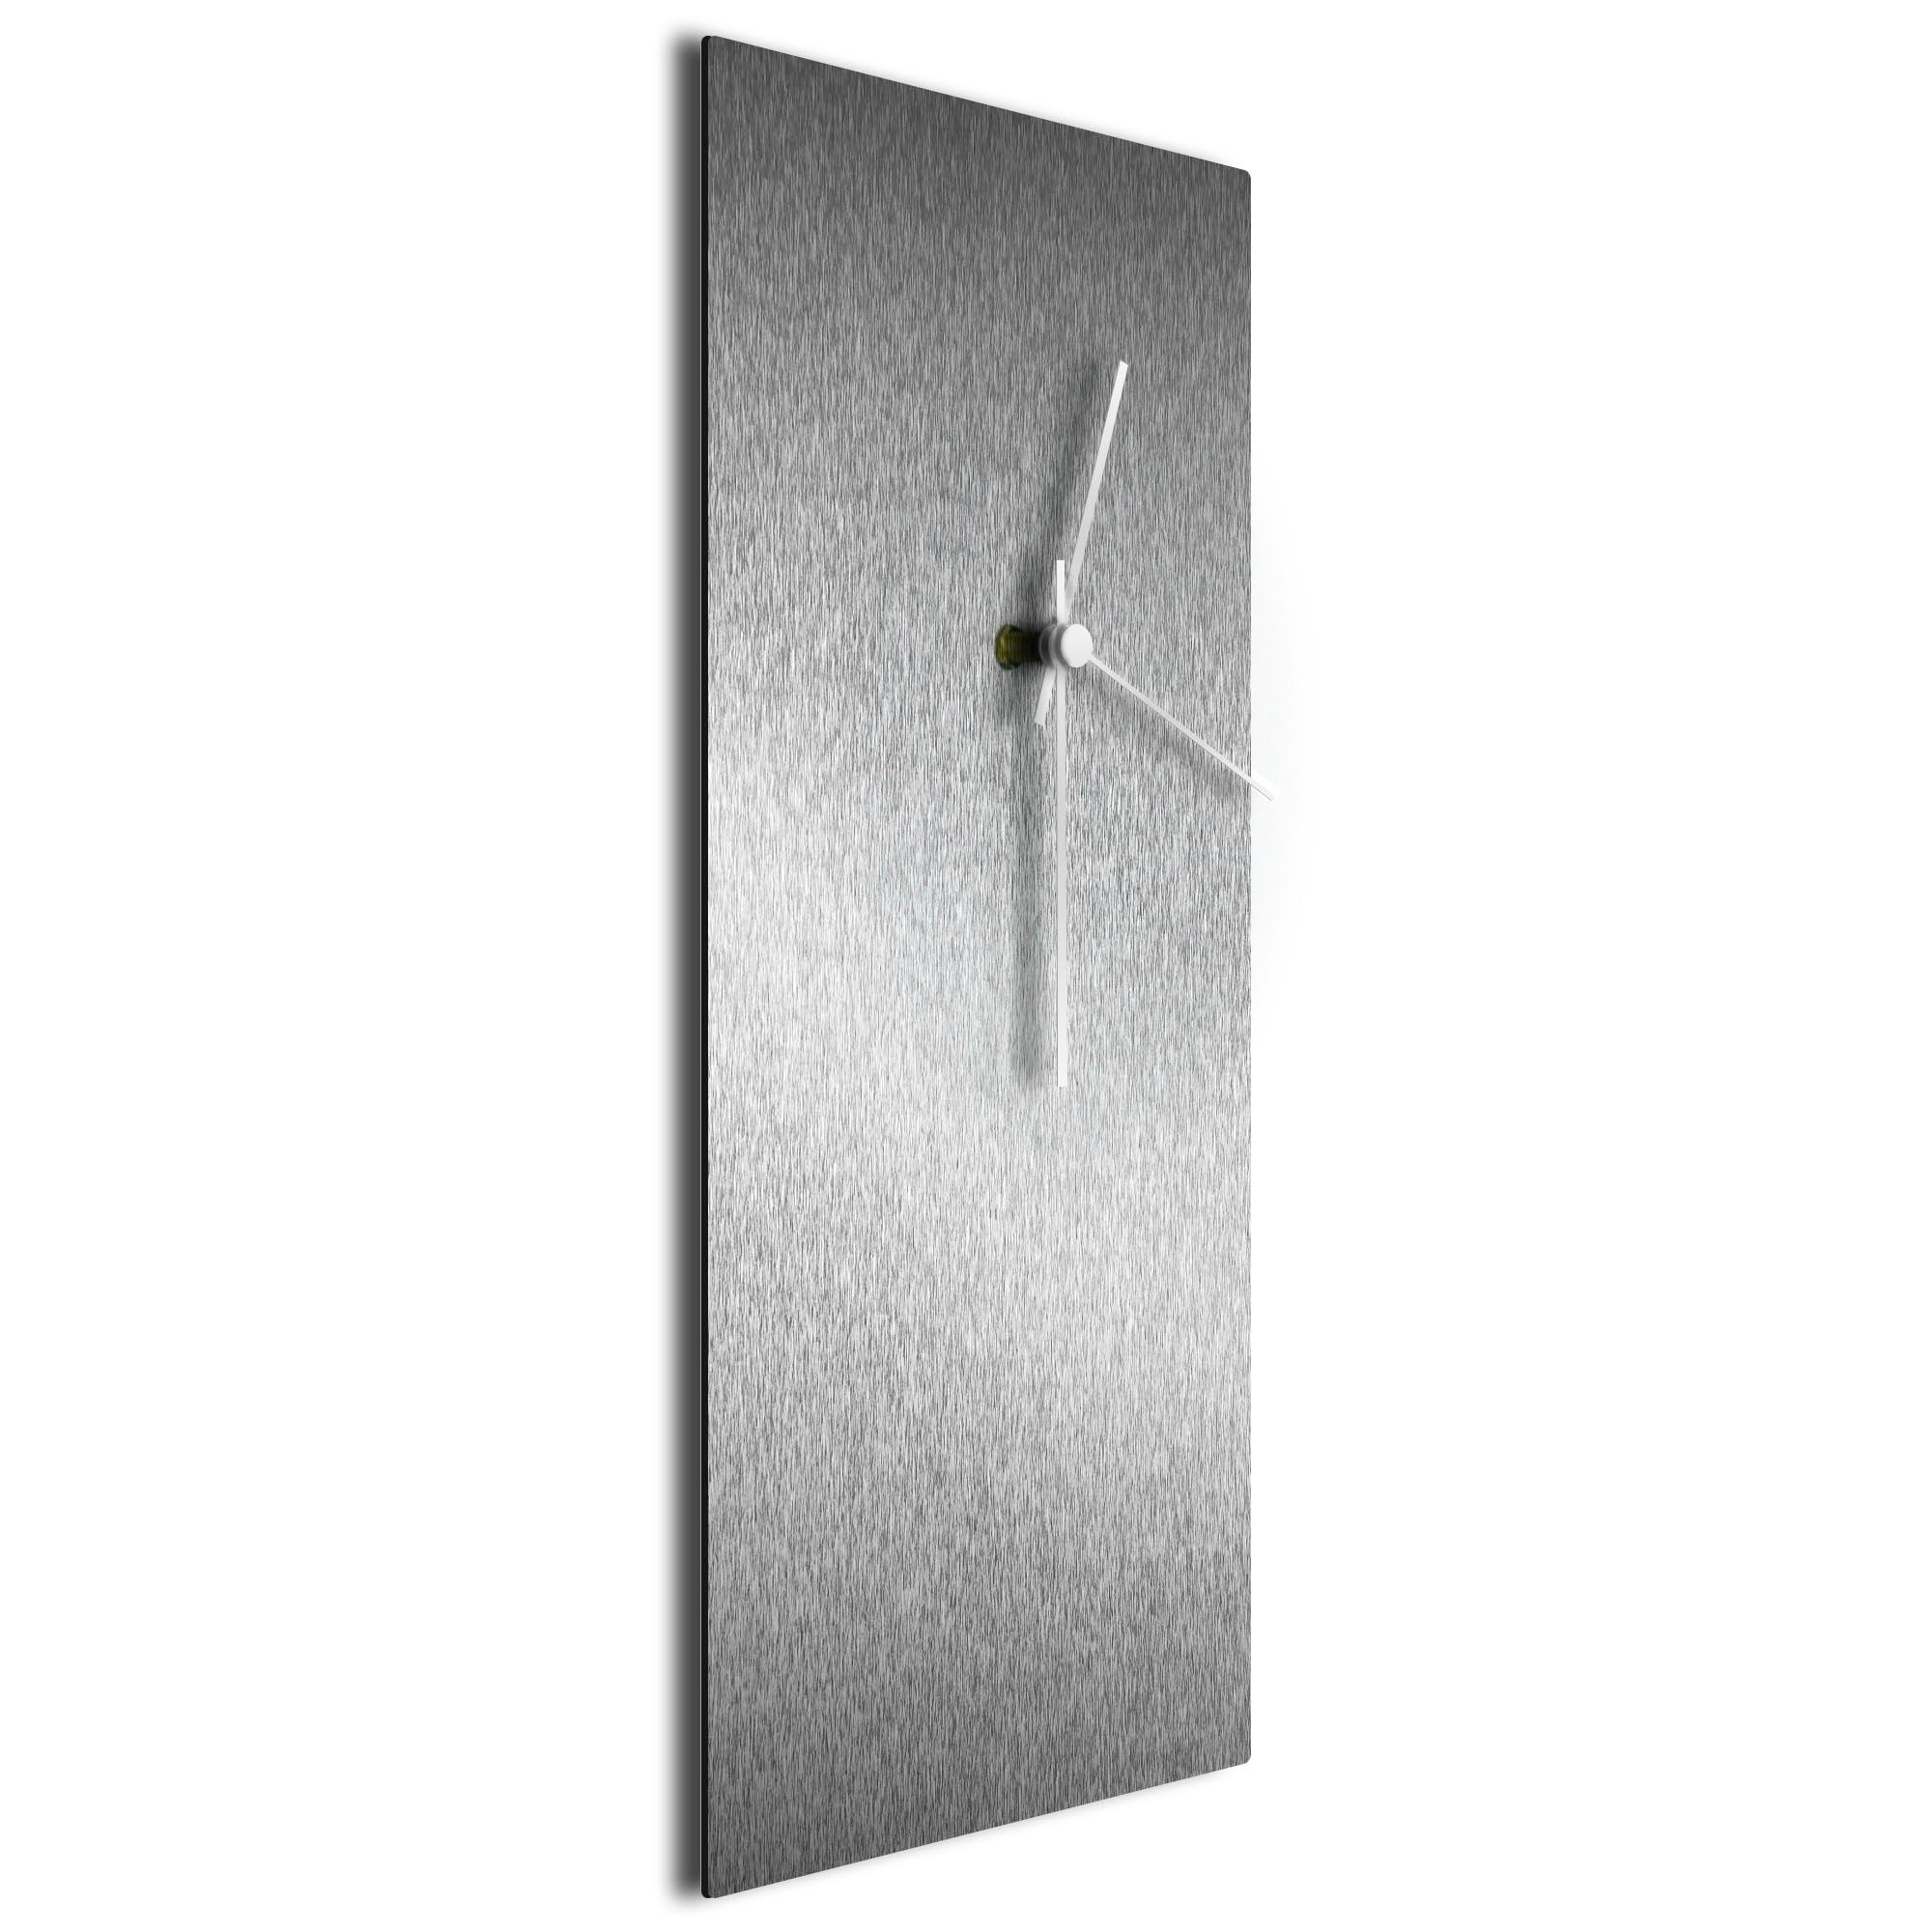 Silversmith Clock White - Image 2